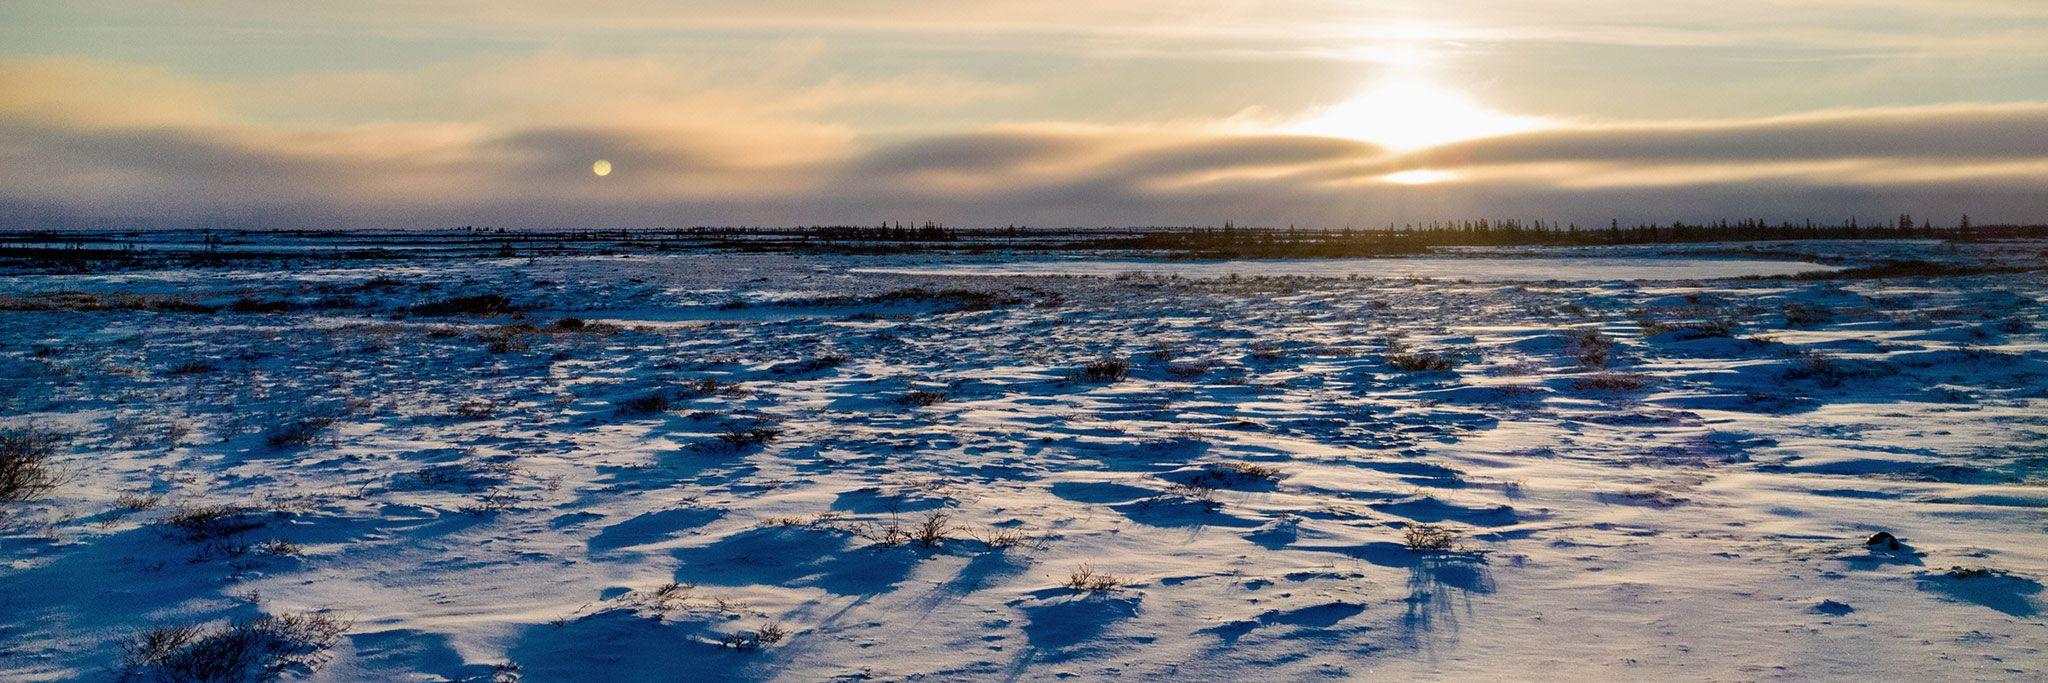 Path Across Frozen Arctic Tundra Was >> Incredibly Tough A Polar Adventure Sherry Ott And Juliana Dever